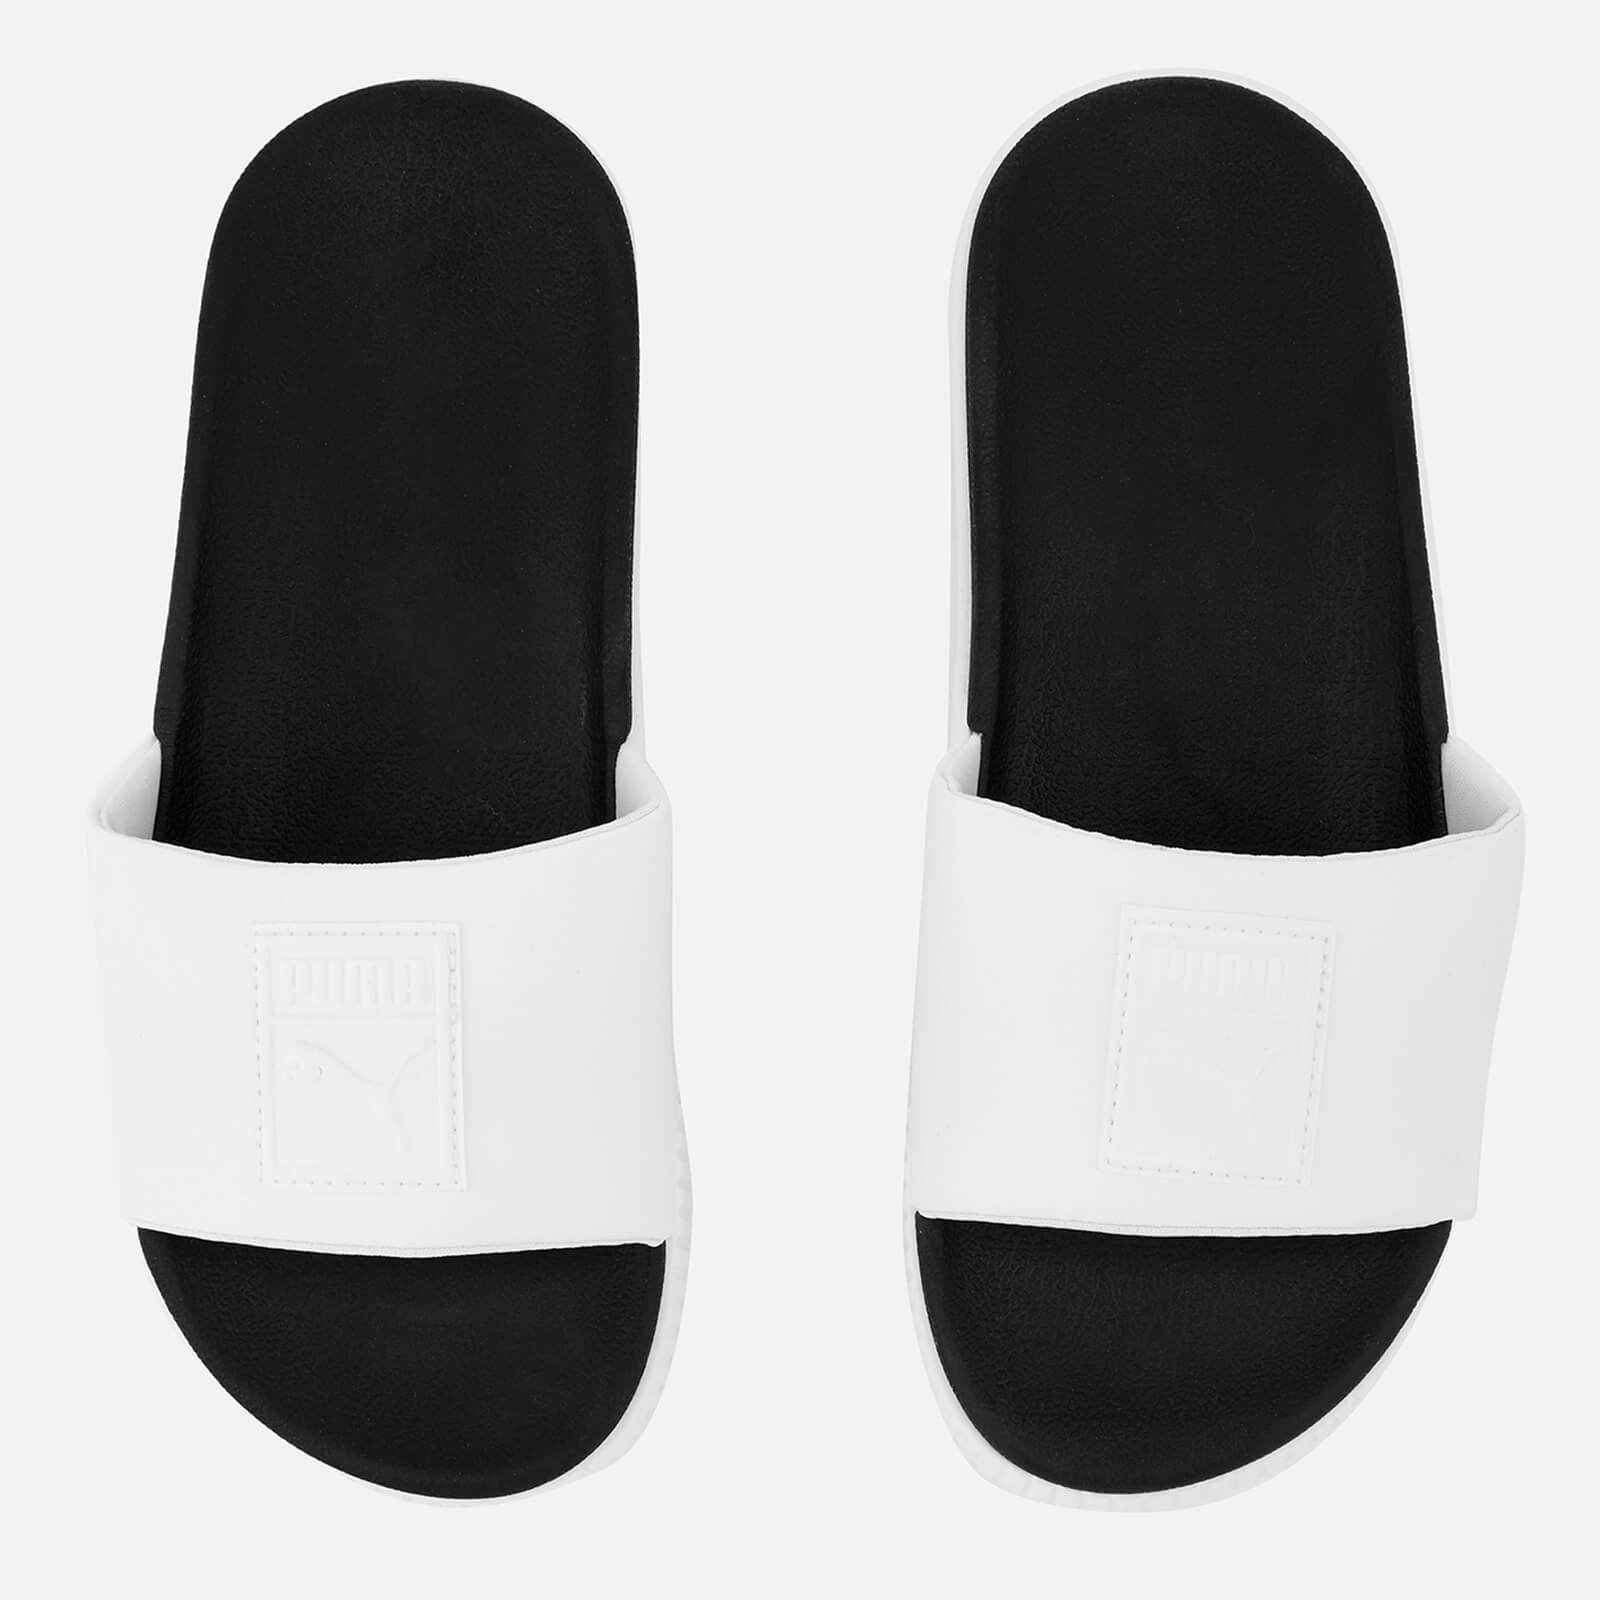 9bb55ed09 Puma Women s Platform Slide Sandals - White Black Womens Footwear ...